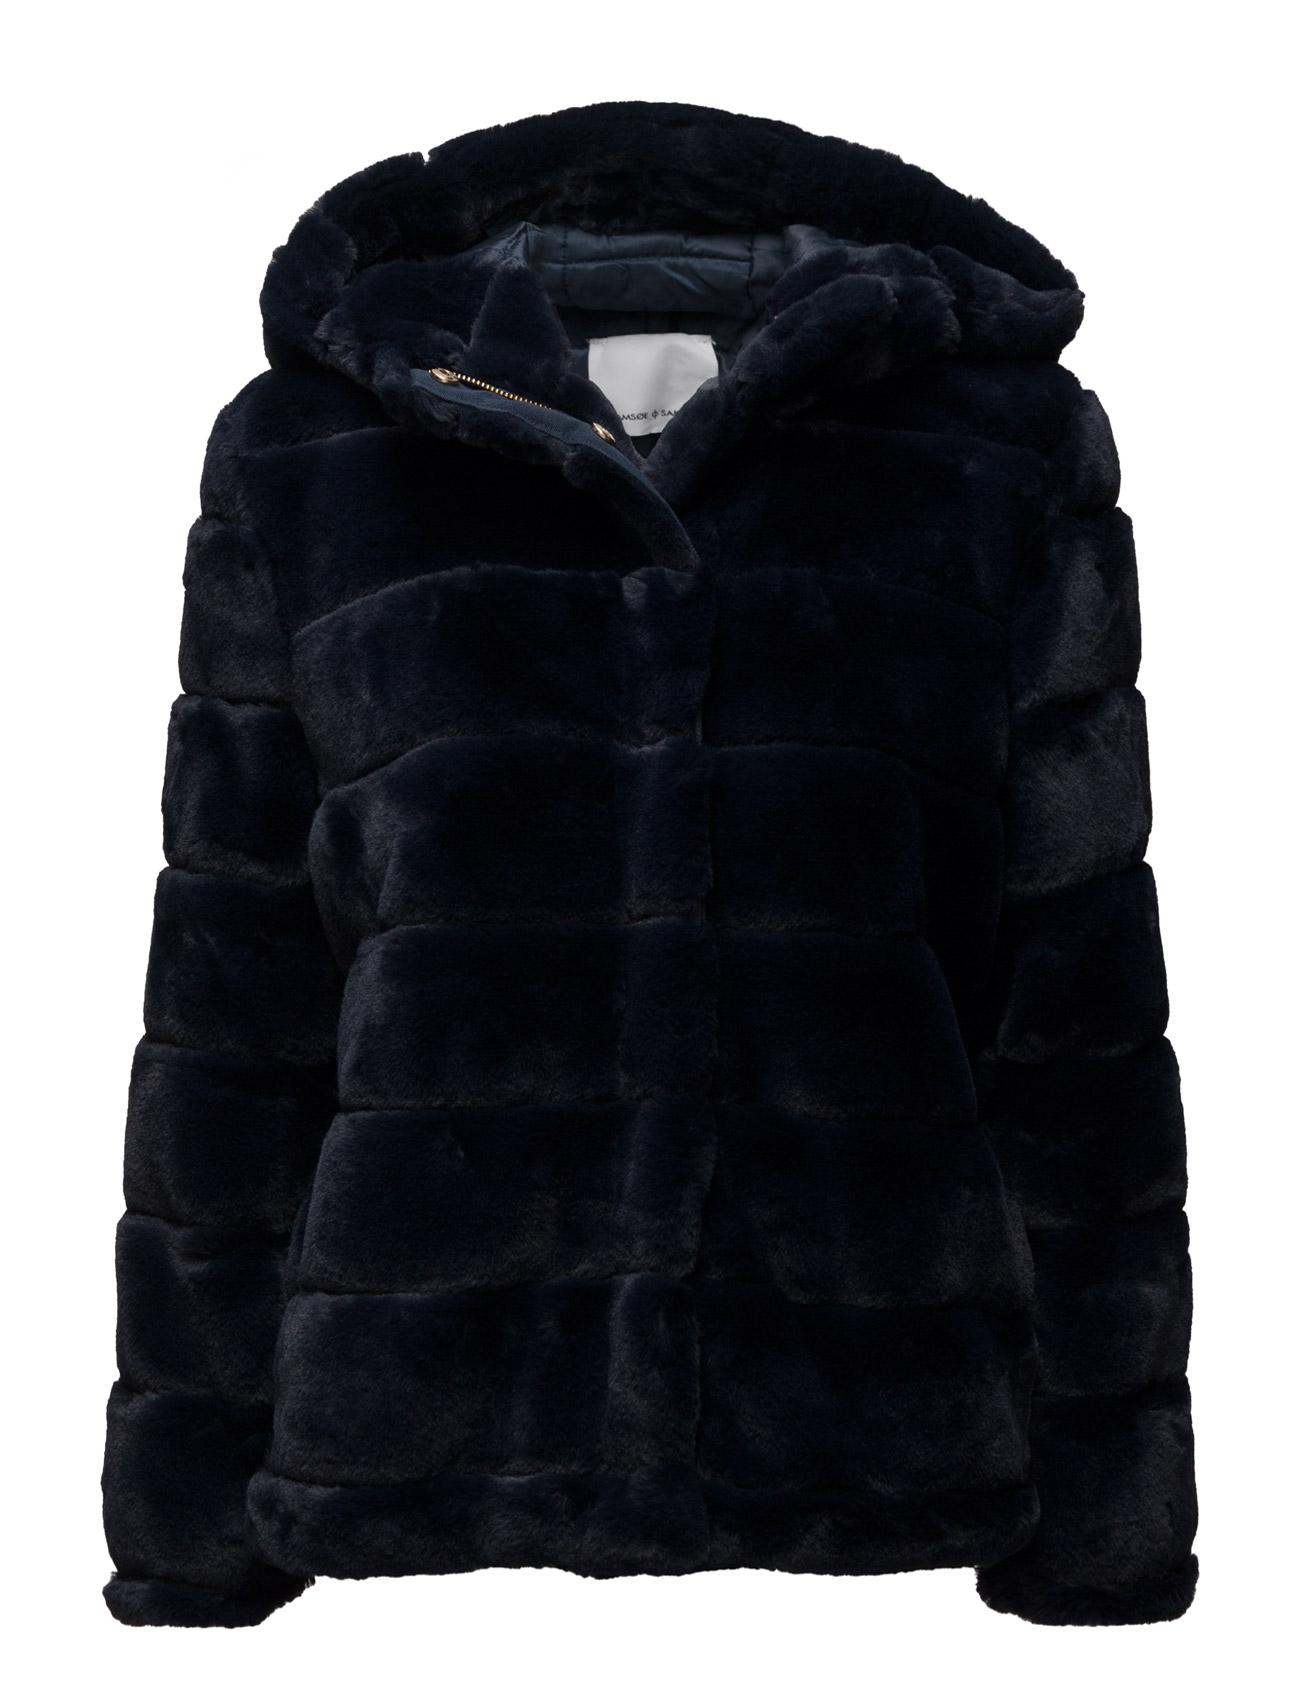 Samsøe & Samsøe Saba jacket 7309